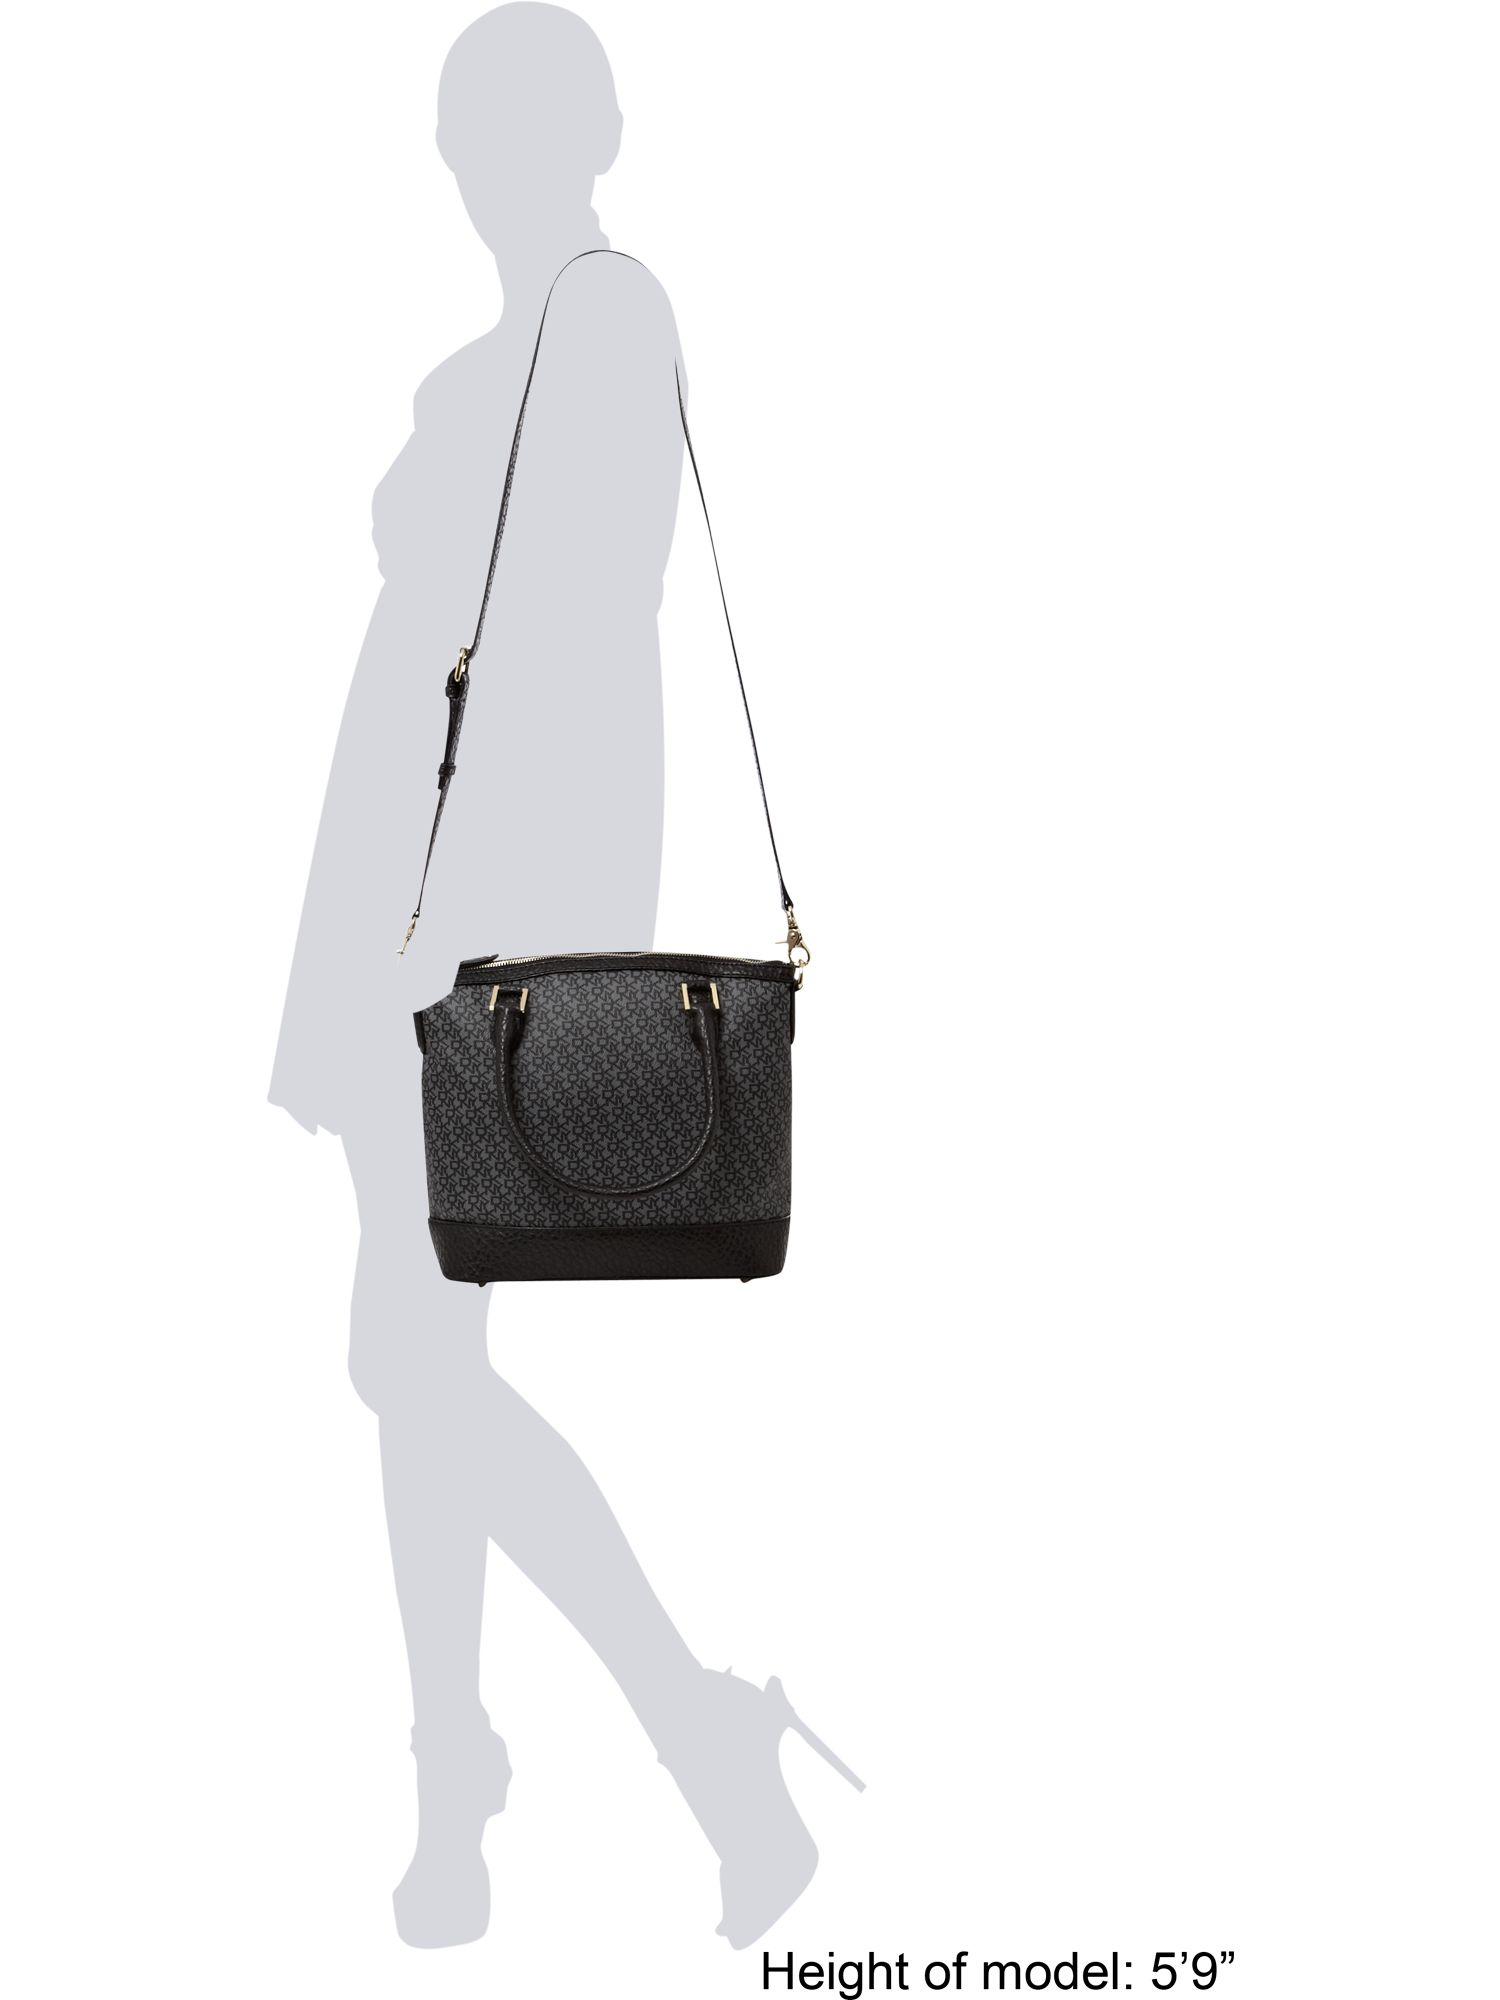 DKNY Coated Logo Tote Bag in Black